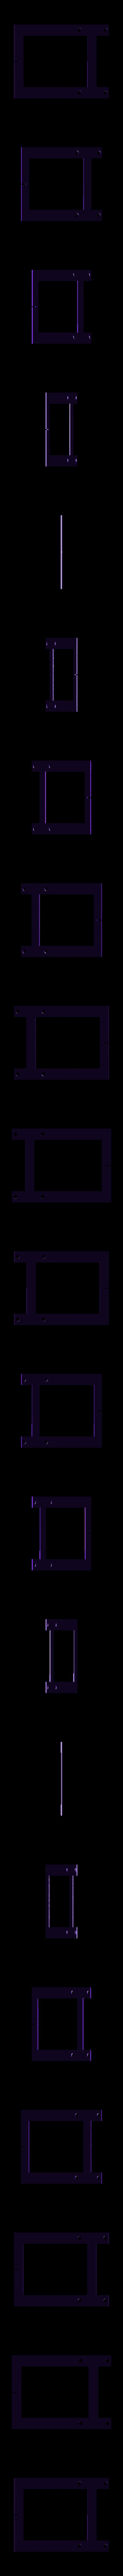 sjabloon_z_motor_bracket.stl Download free STL file Portable 3D Printer • 3D printable design, Job